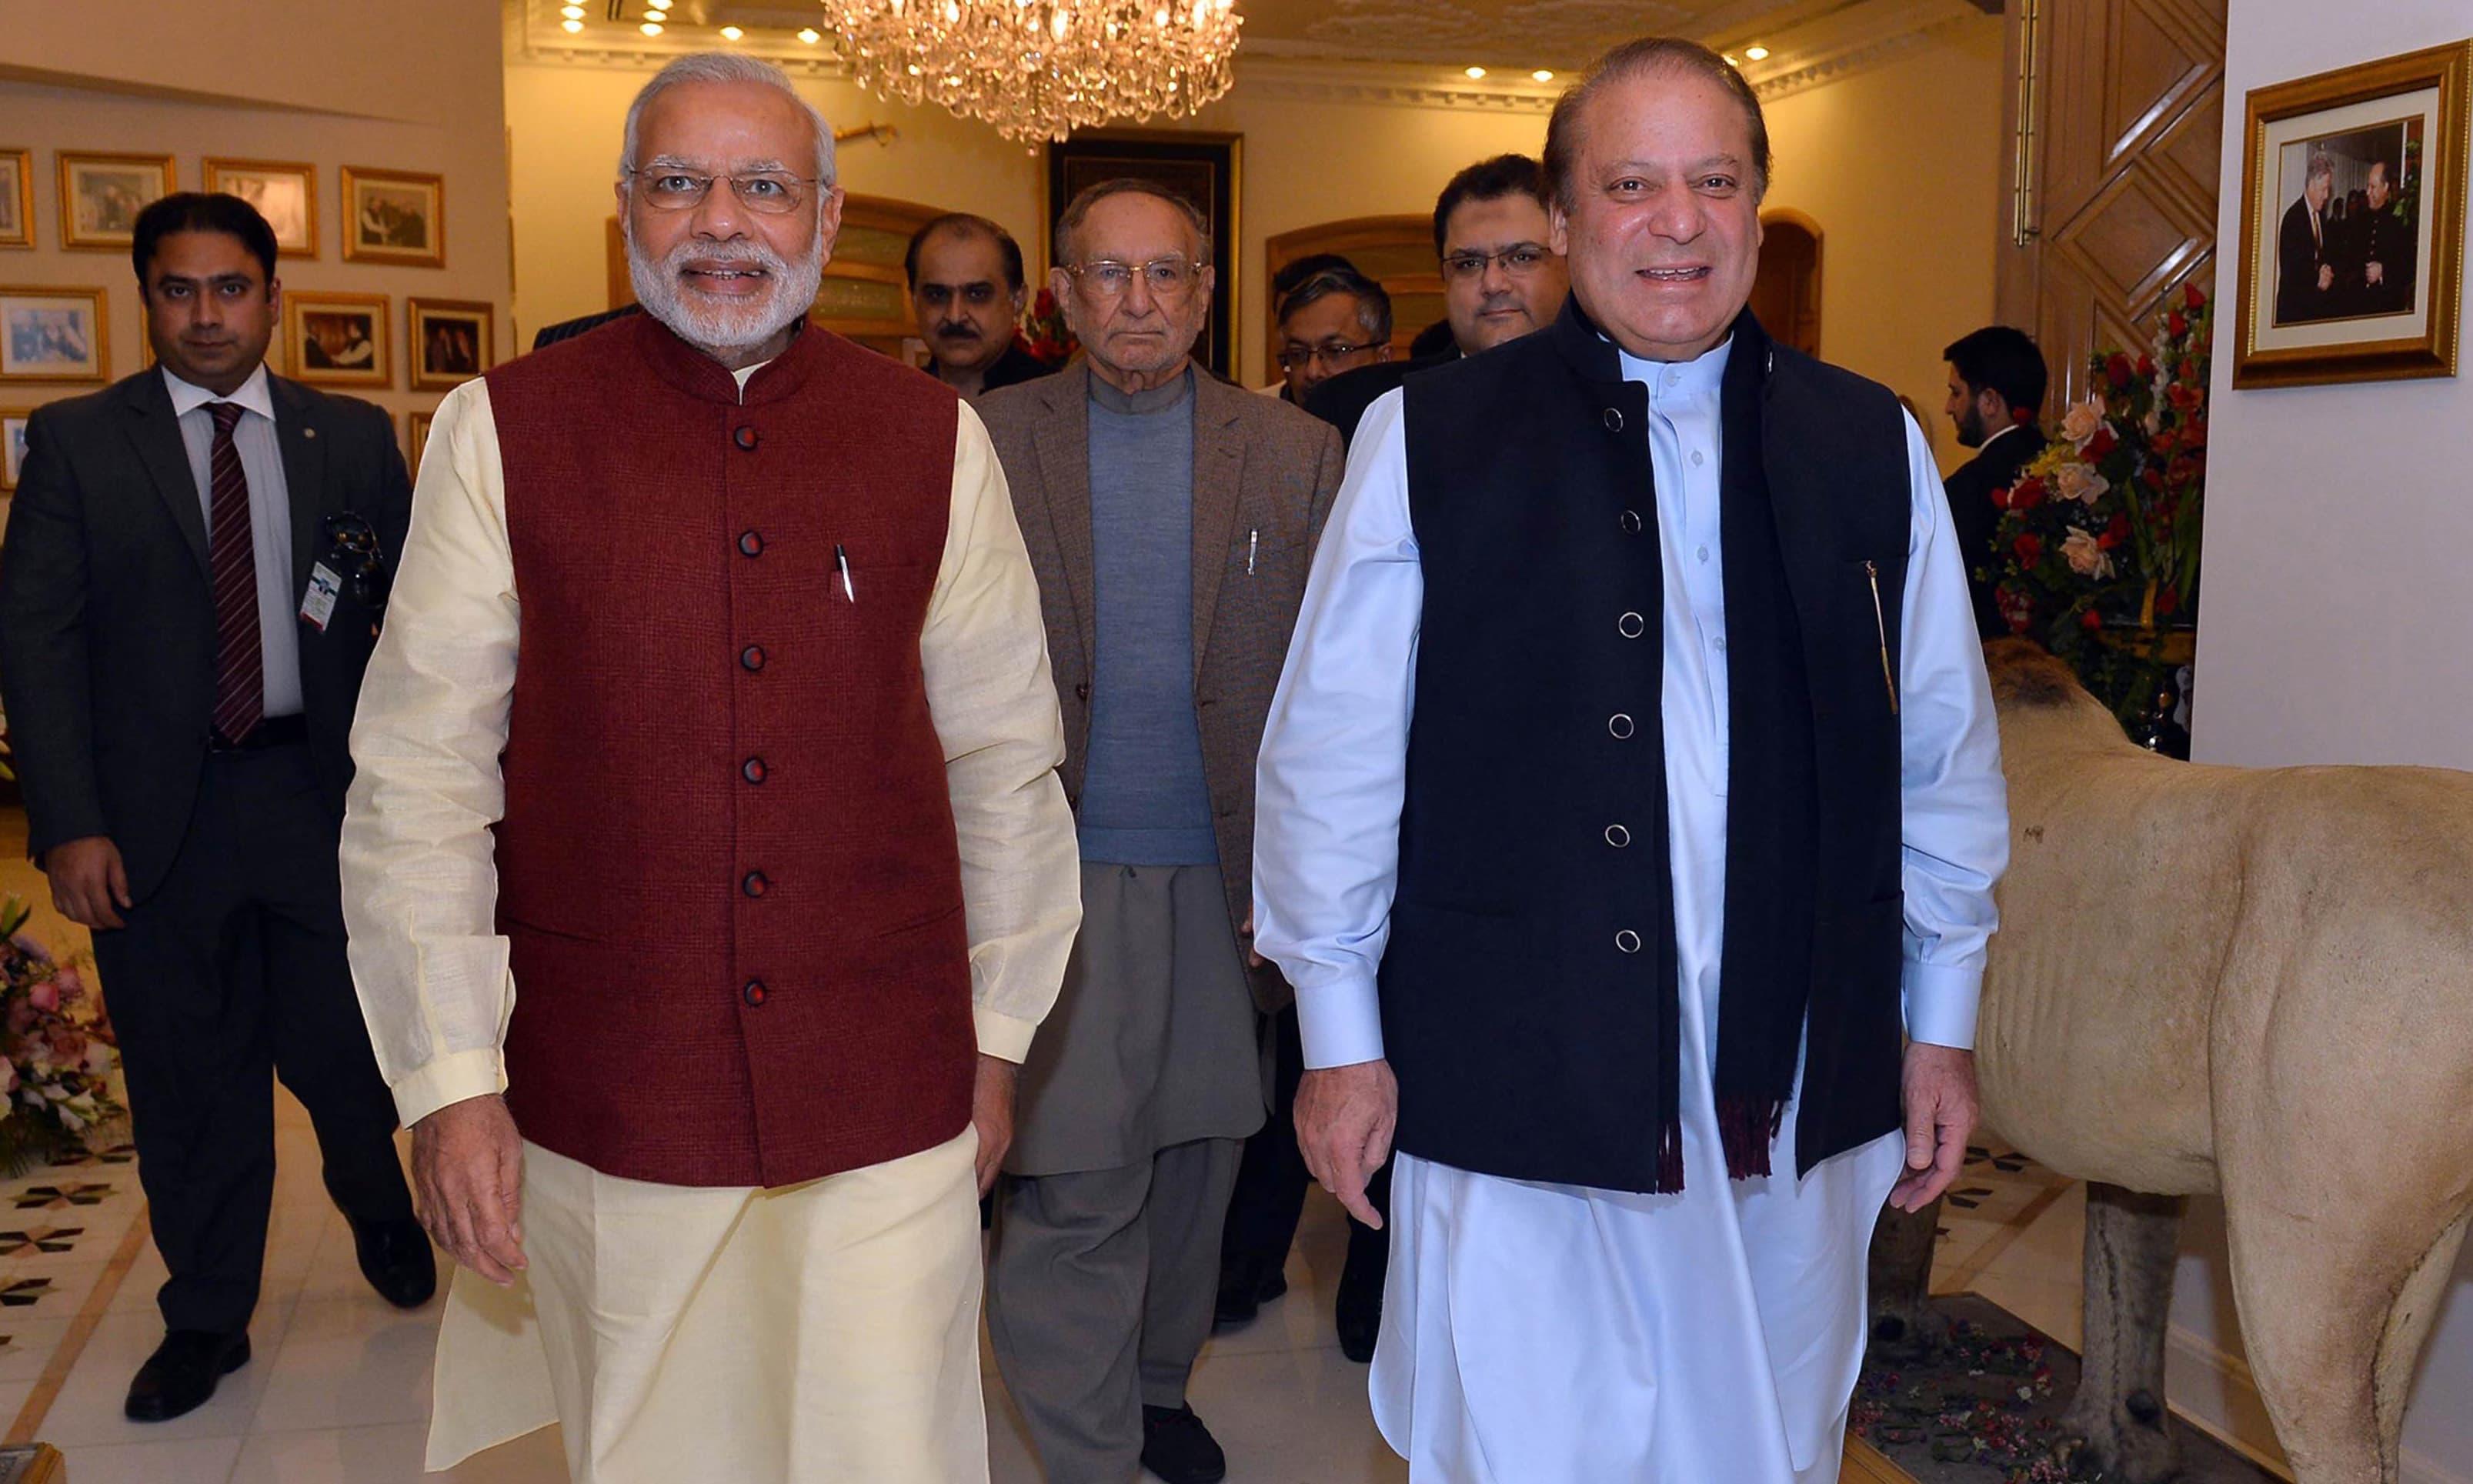 Narendra Modi made a surprise visit to Pakistan to meet his counterpart Nawaz Sharif. —AFP/File